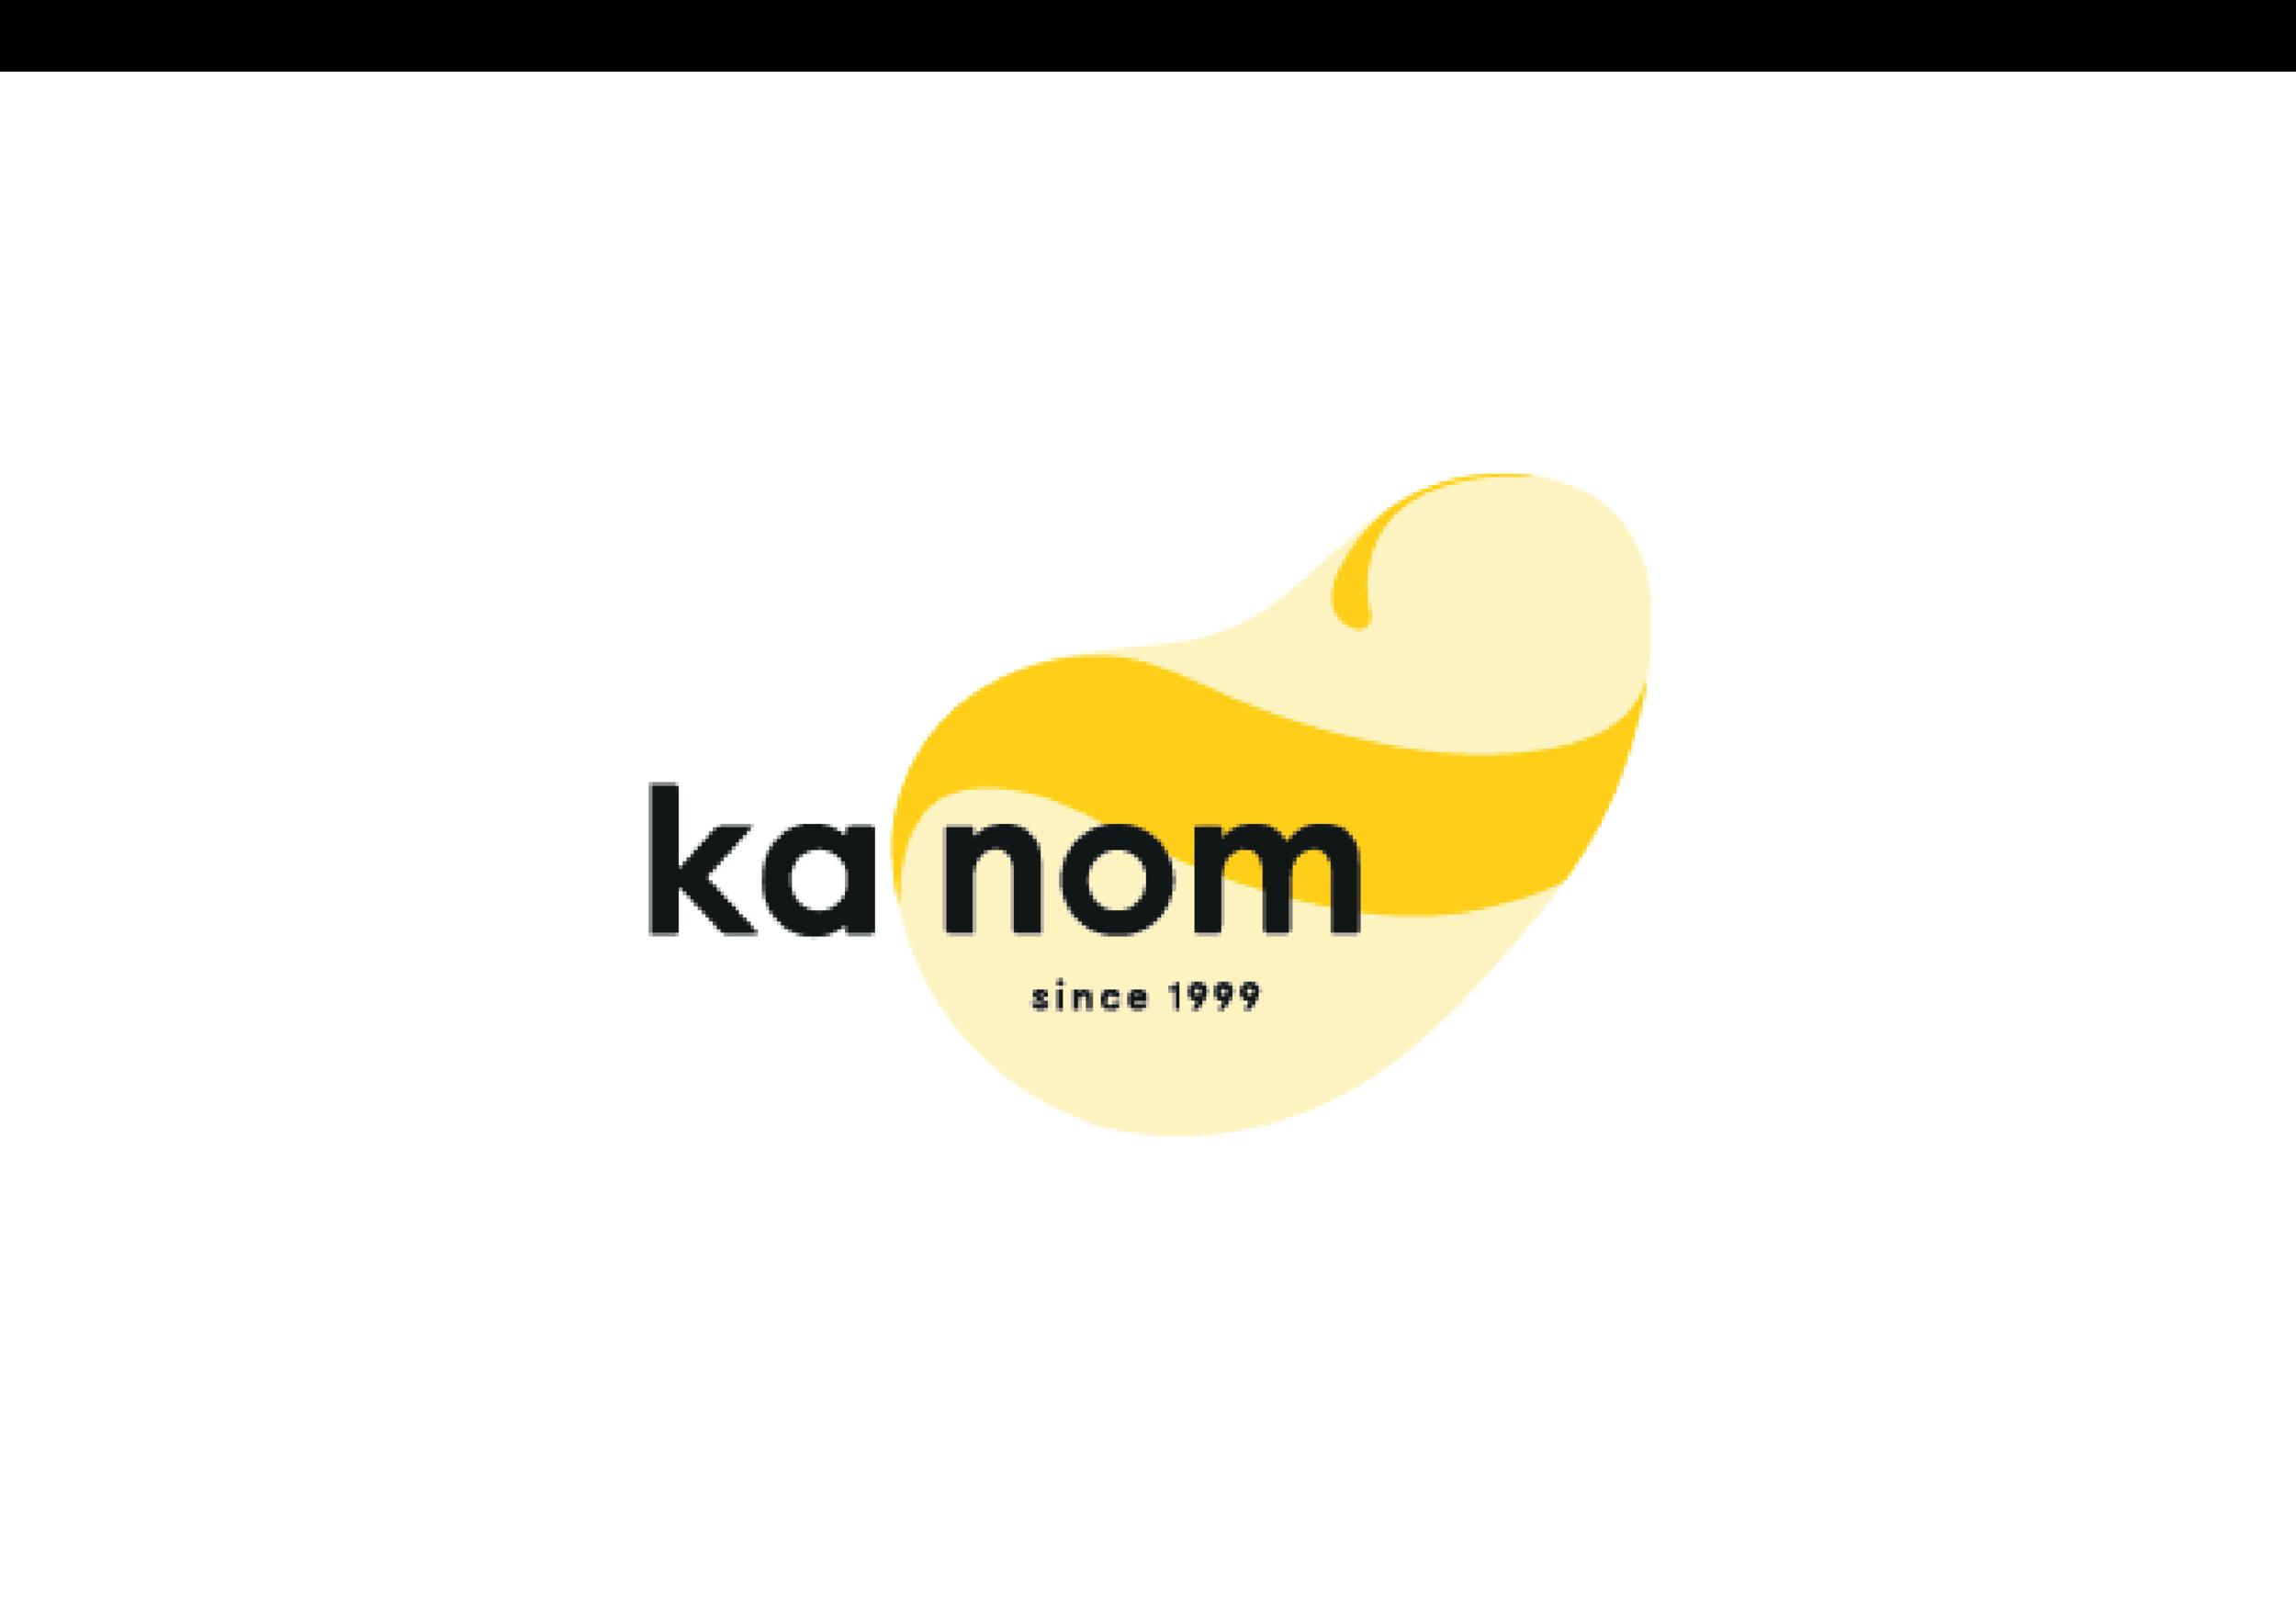 Kanom